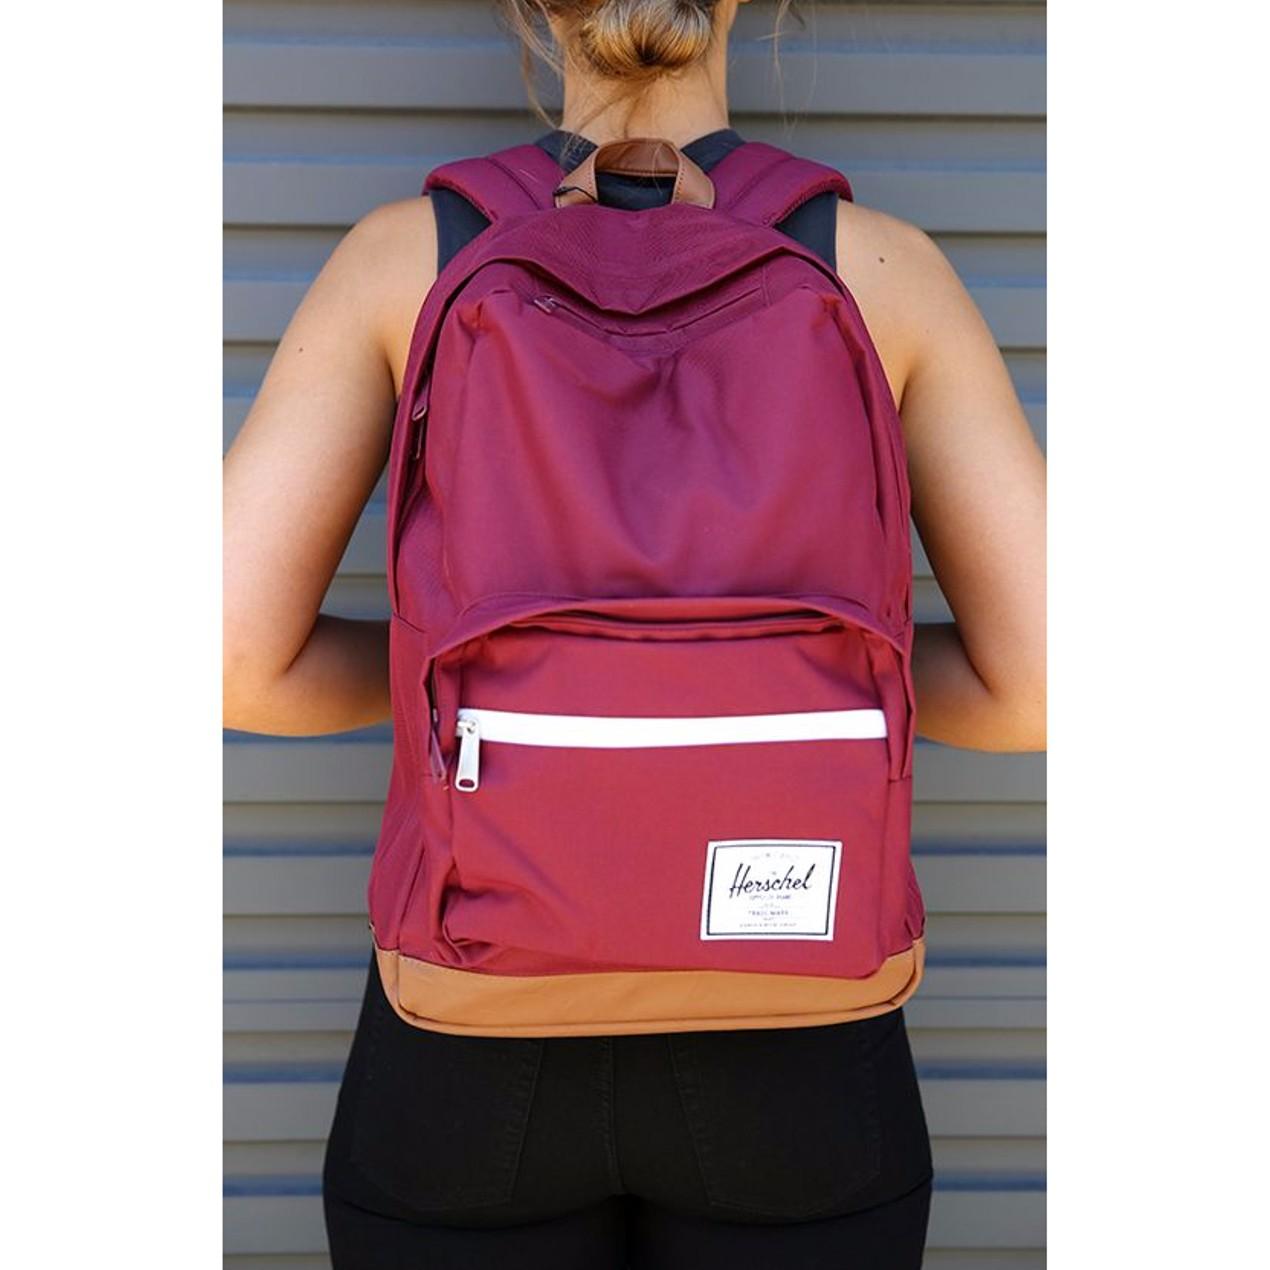 0fb5b6baf3 Herschel Supply Co Pop Quiz Laptop Backpack - Tanga